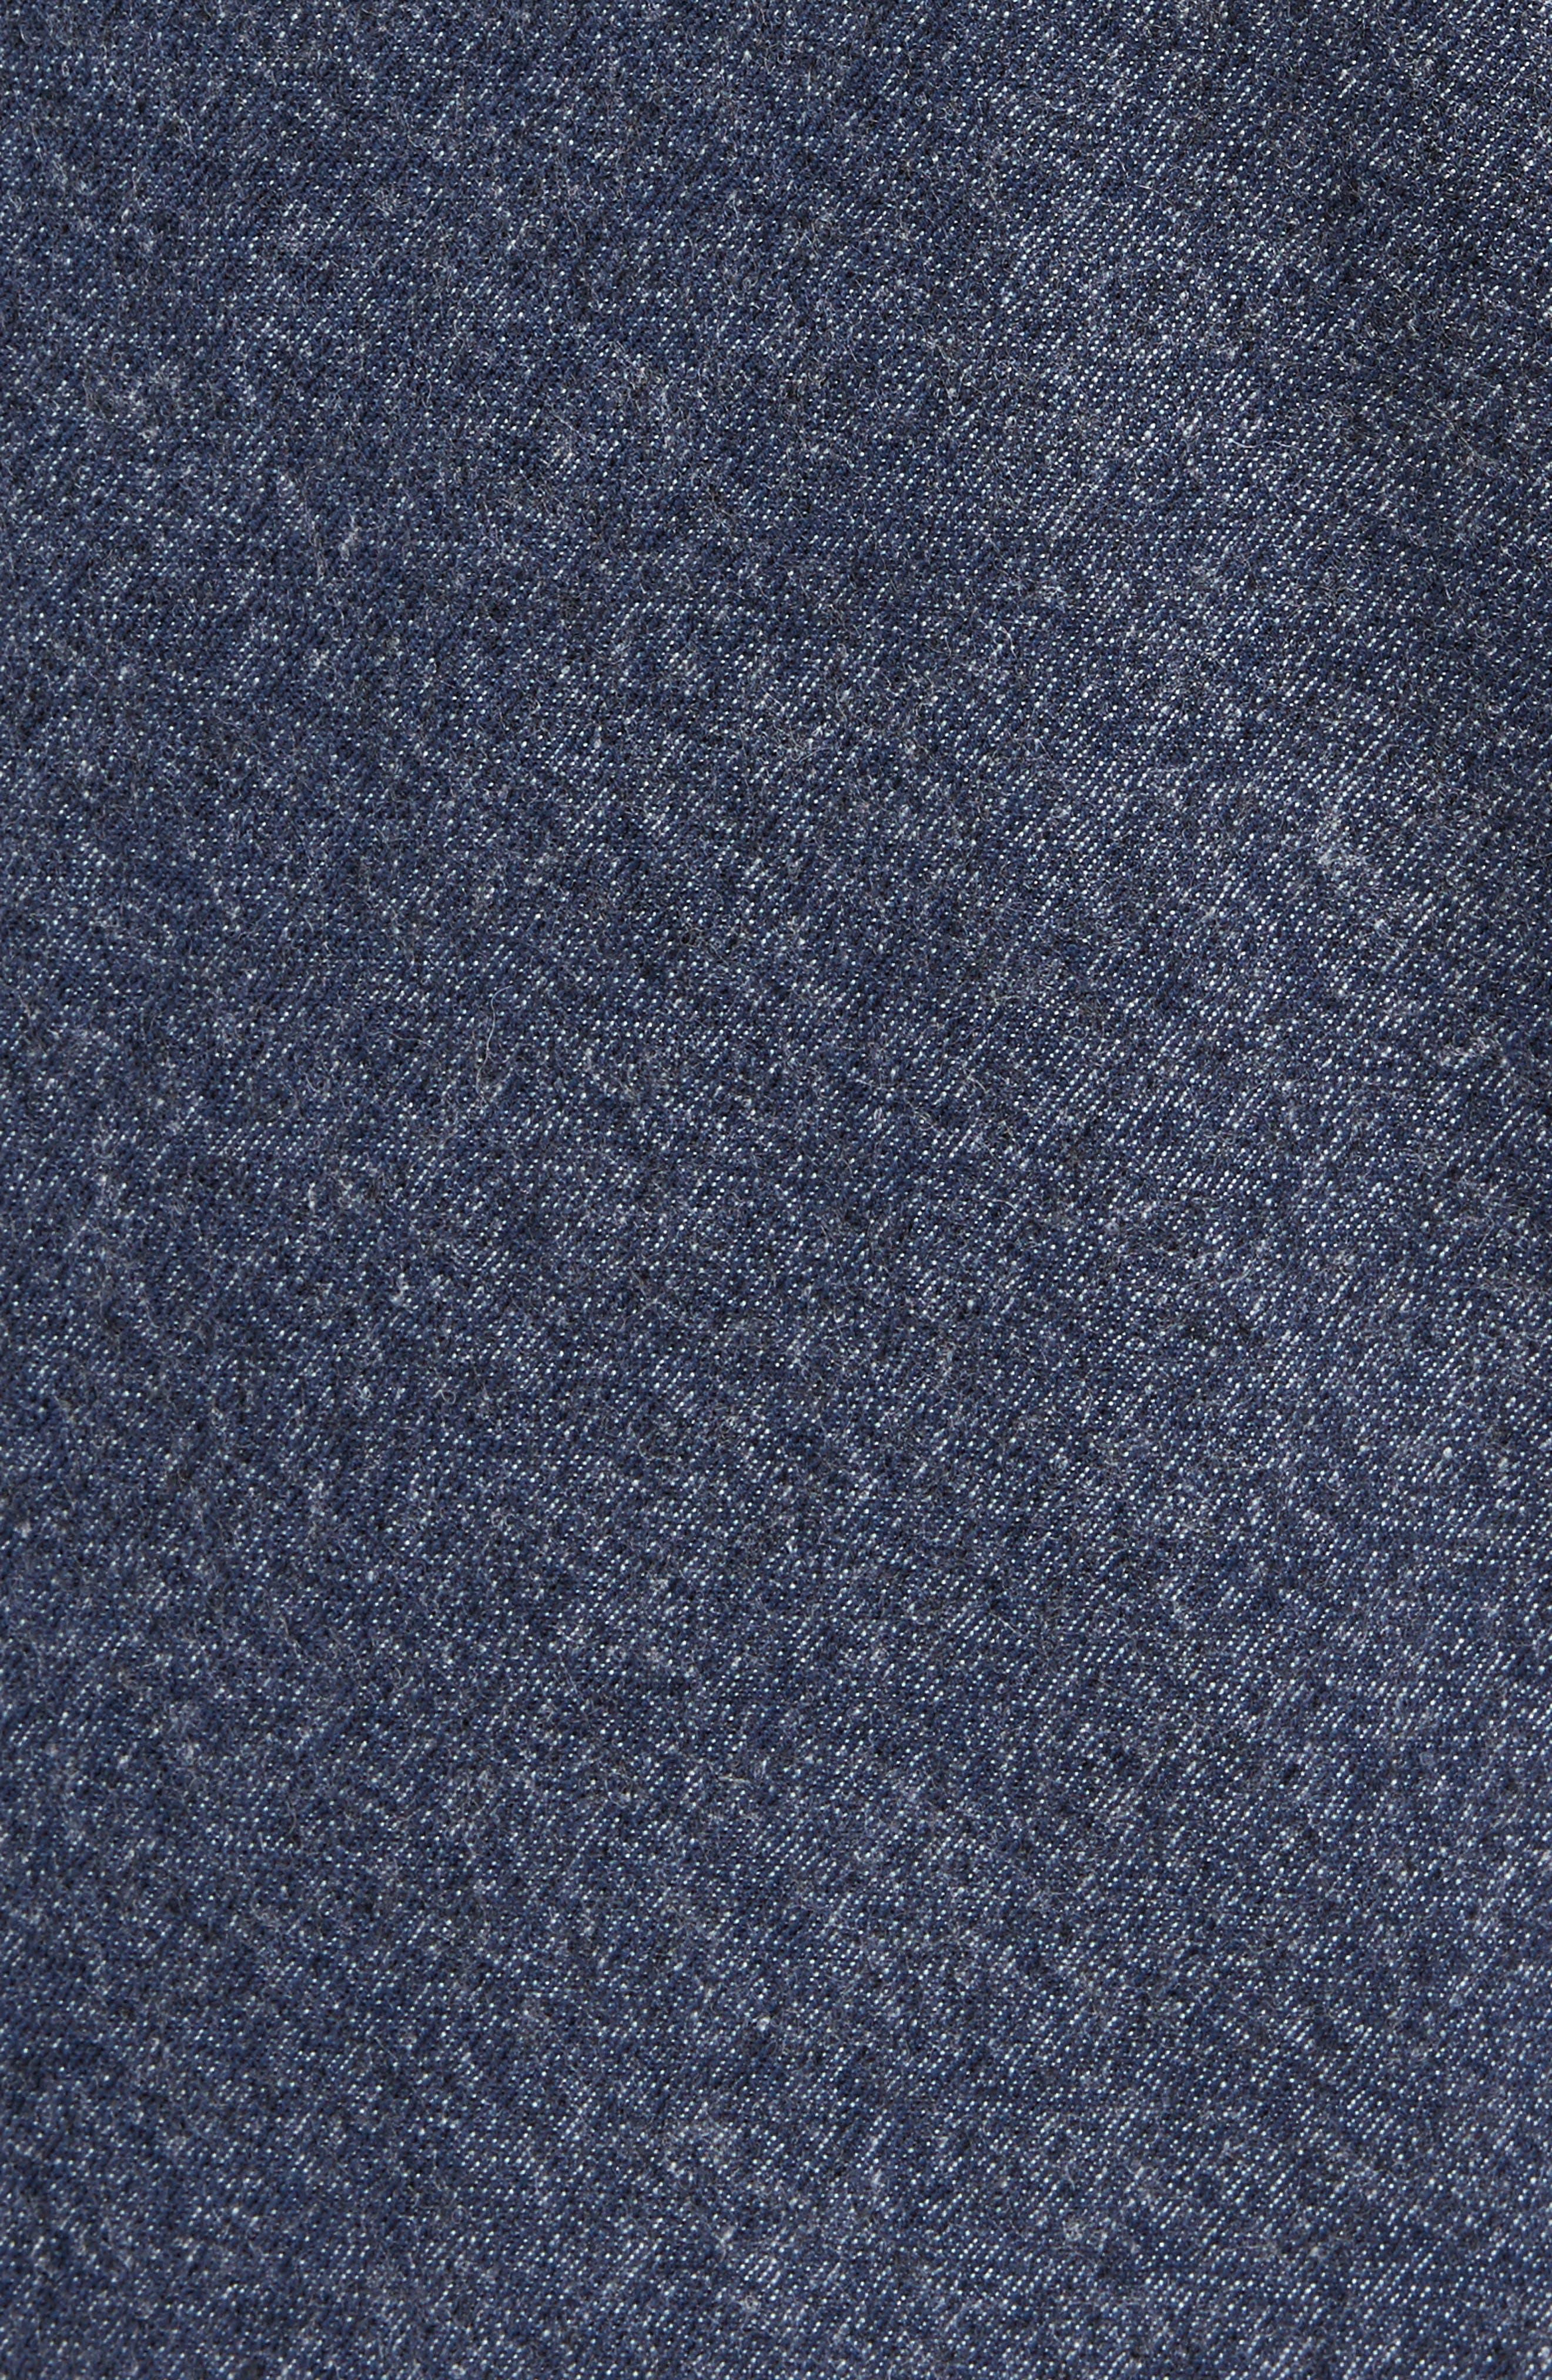 Charleston Wool Blend Sport Coat,                             Alternate thumbnail 6, color,                             414